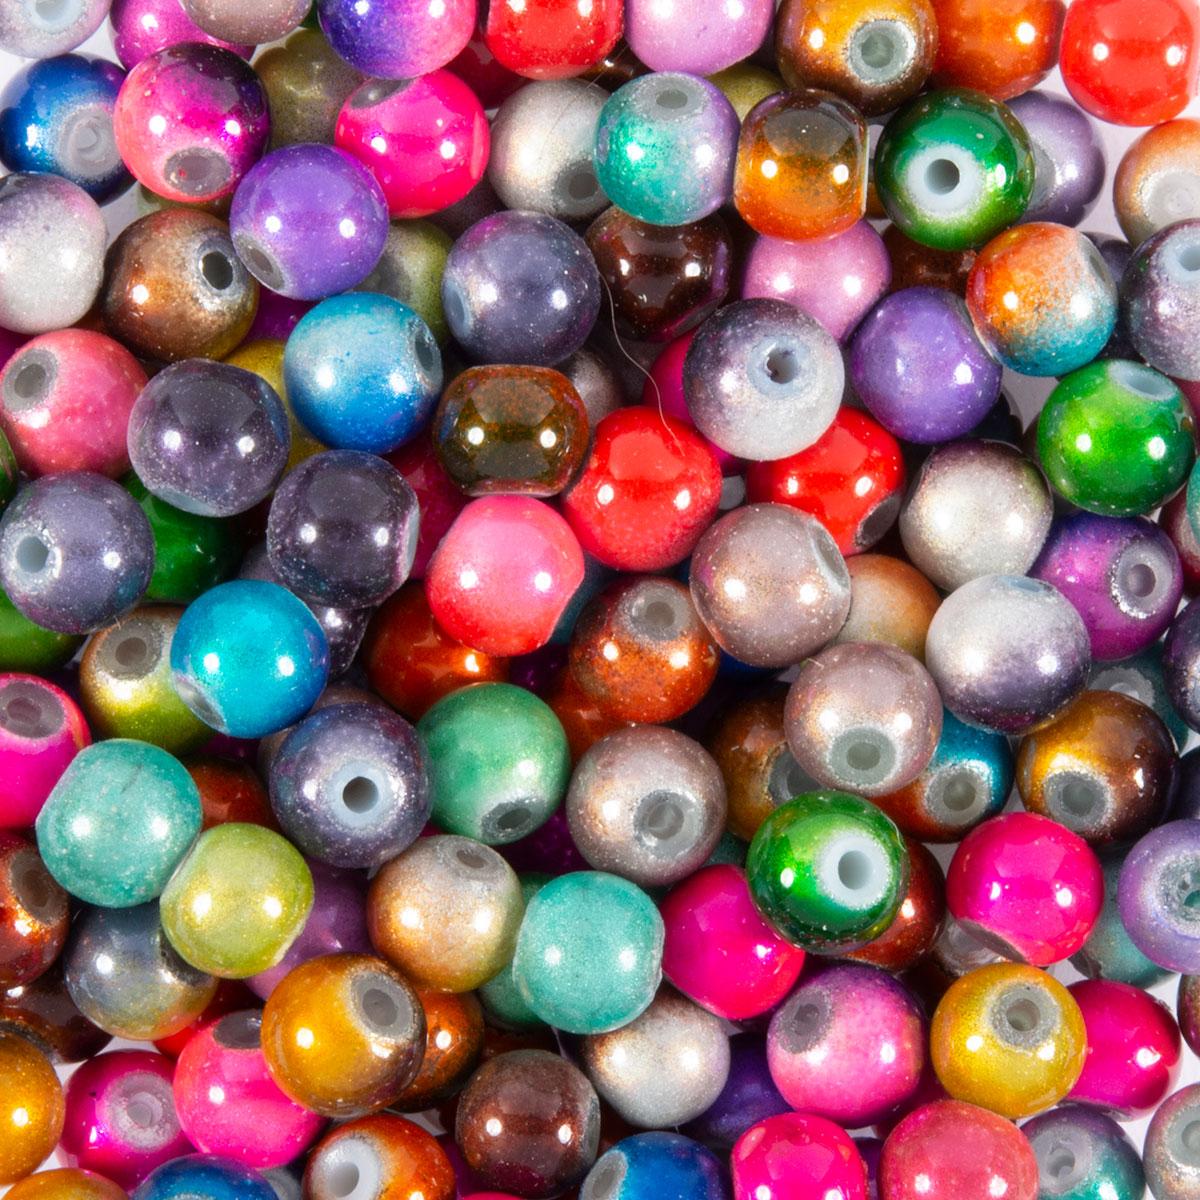 Glaswachsperlen Perlen grün pastell glänzend 6 mm 130 Stück Schmuck Basteln 61